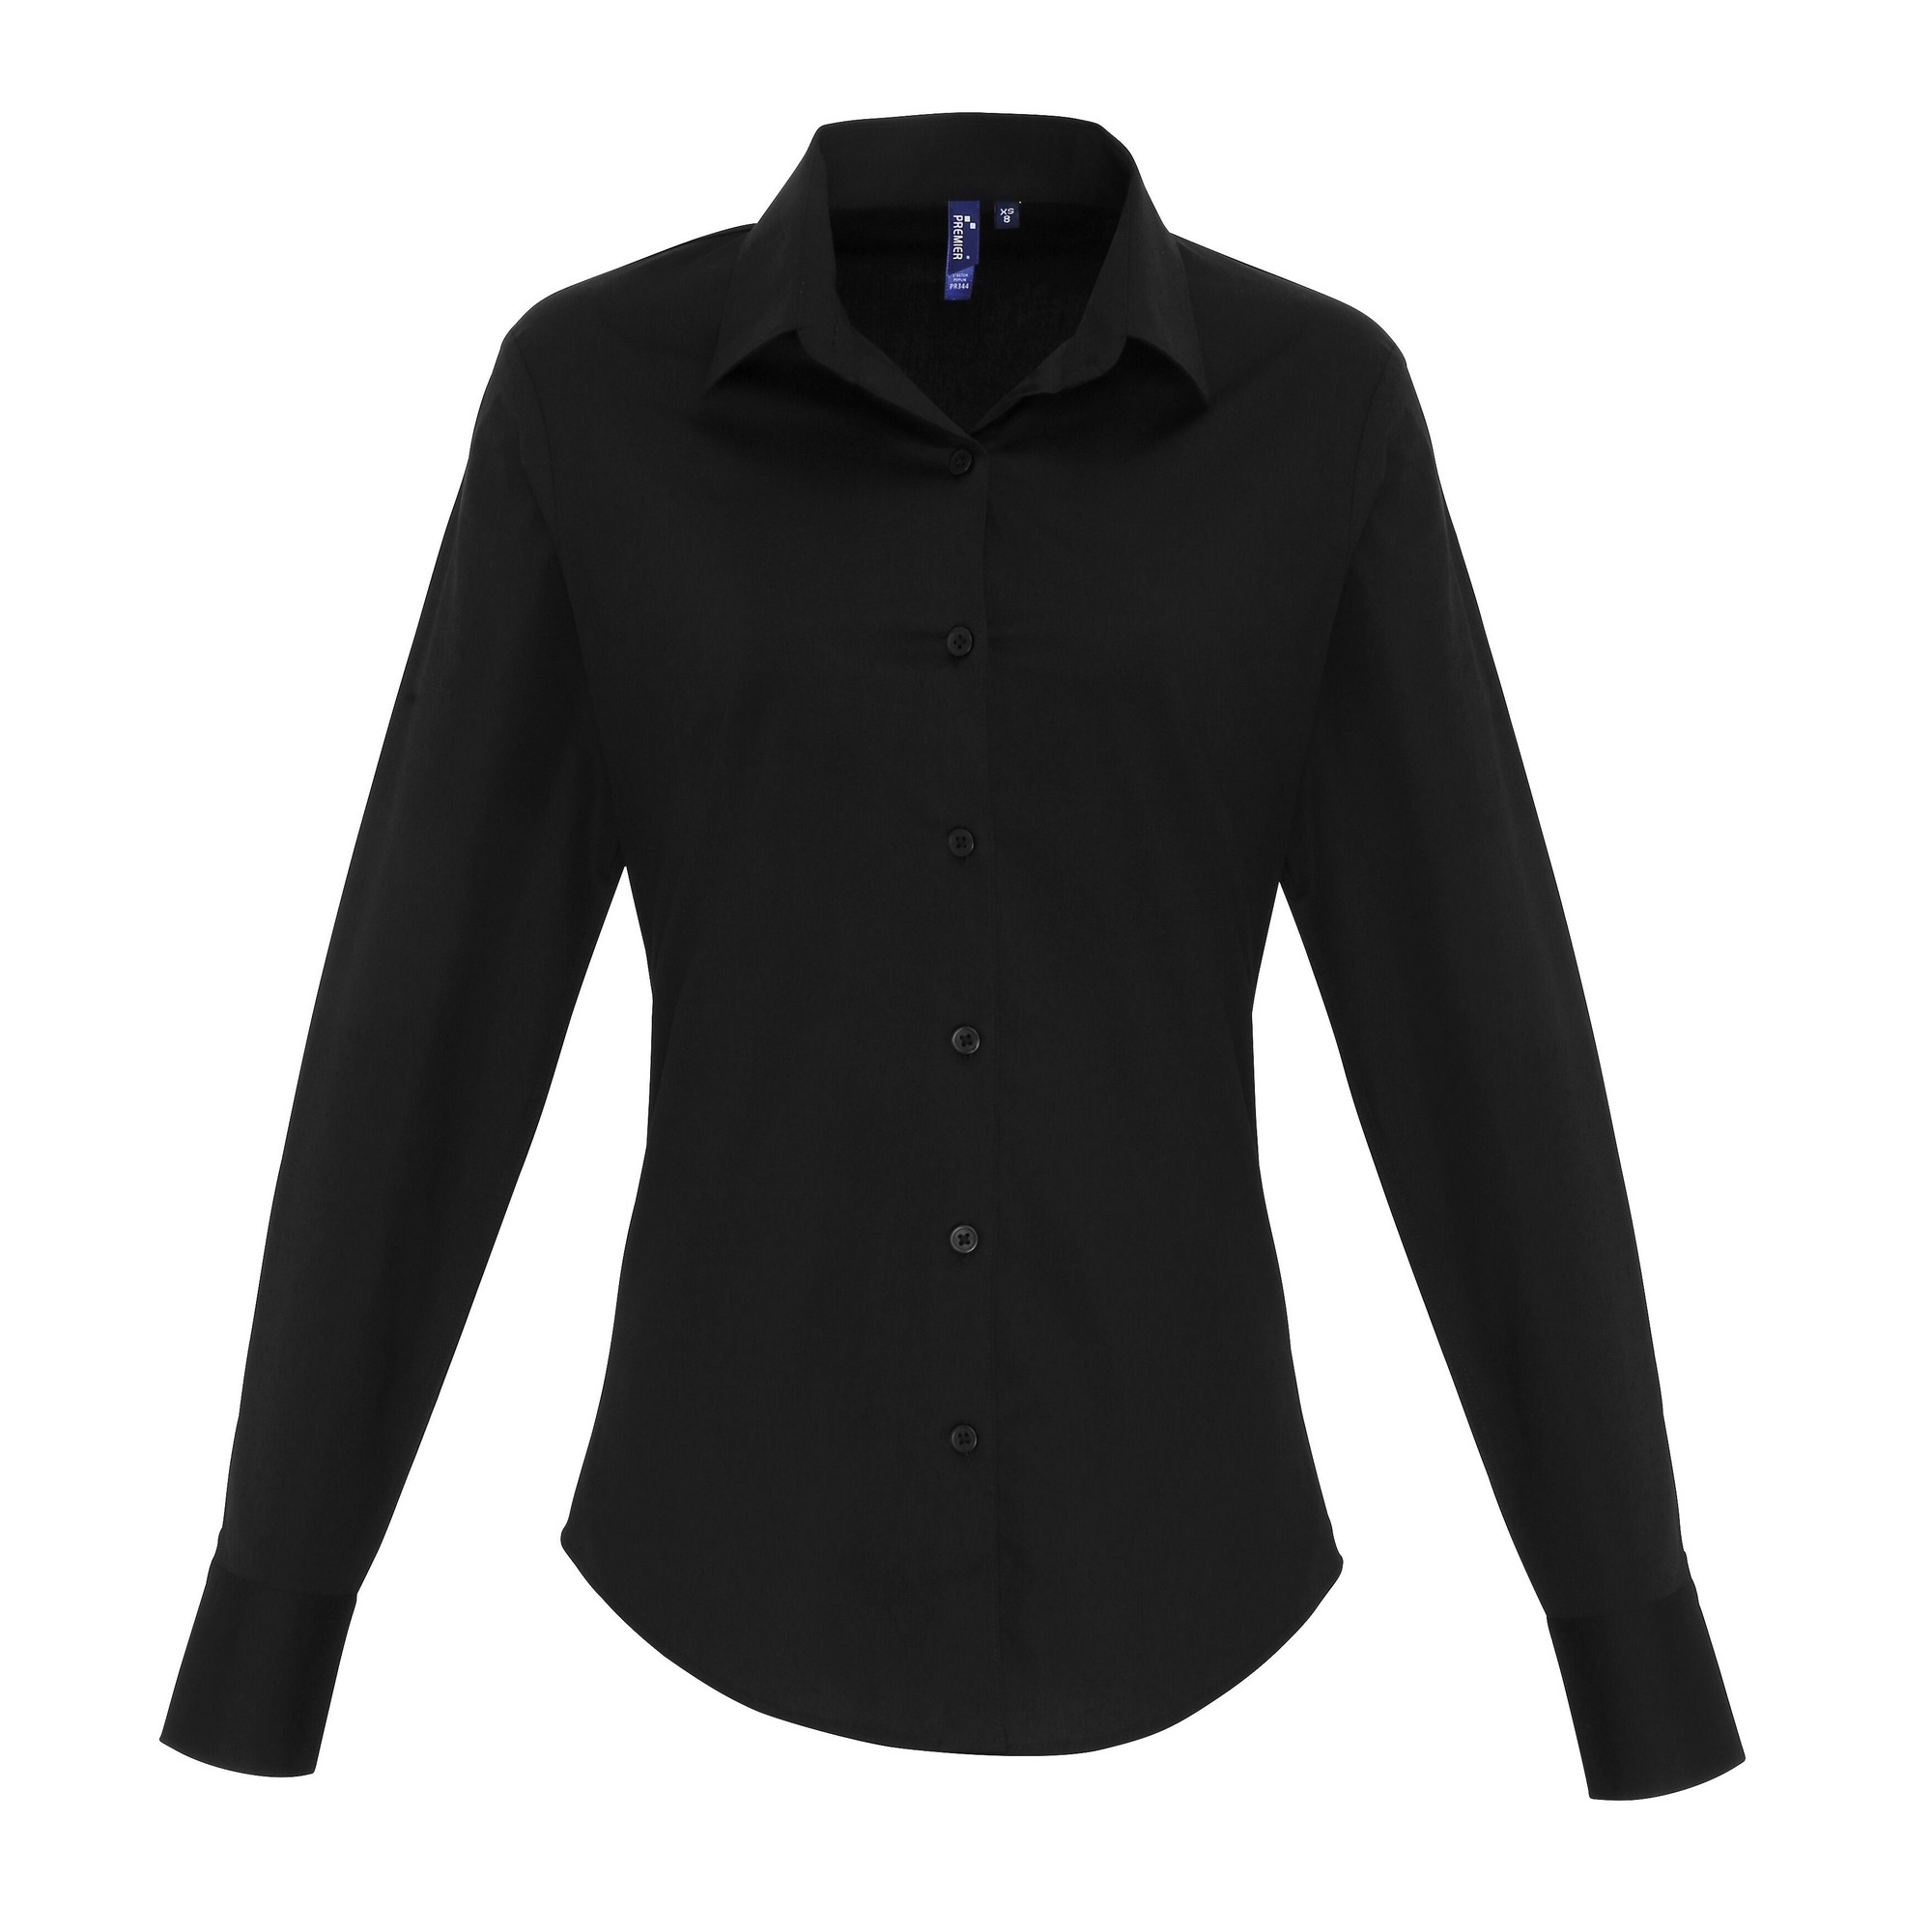 Premier Womens/Ladies Stretch Fit Poplin Long Sleeve Blouse (XS) (Black)